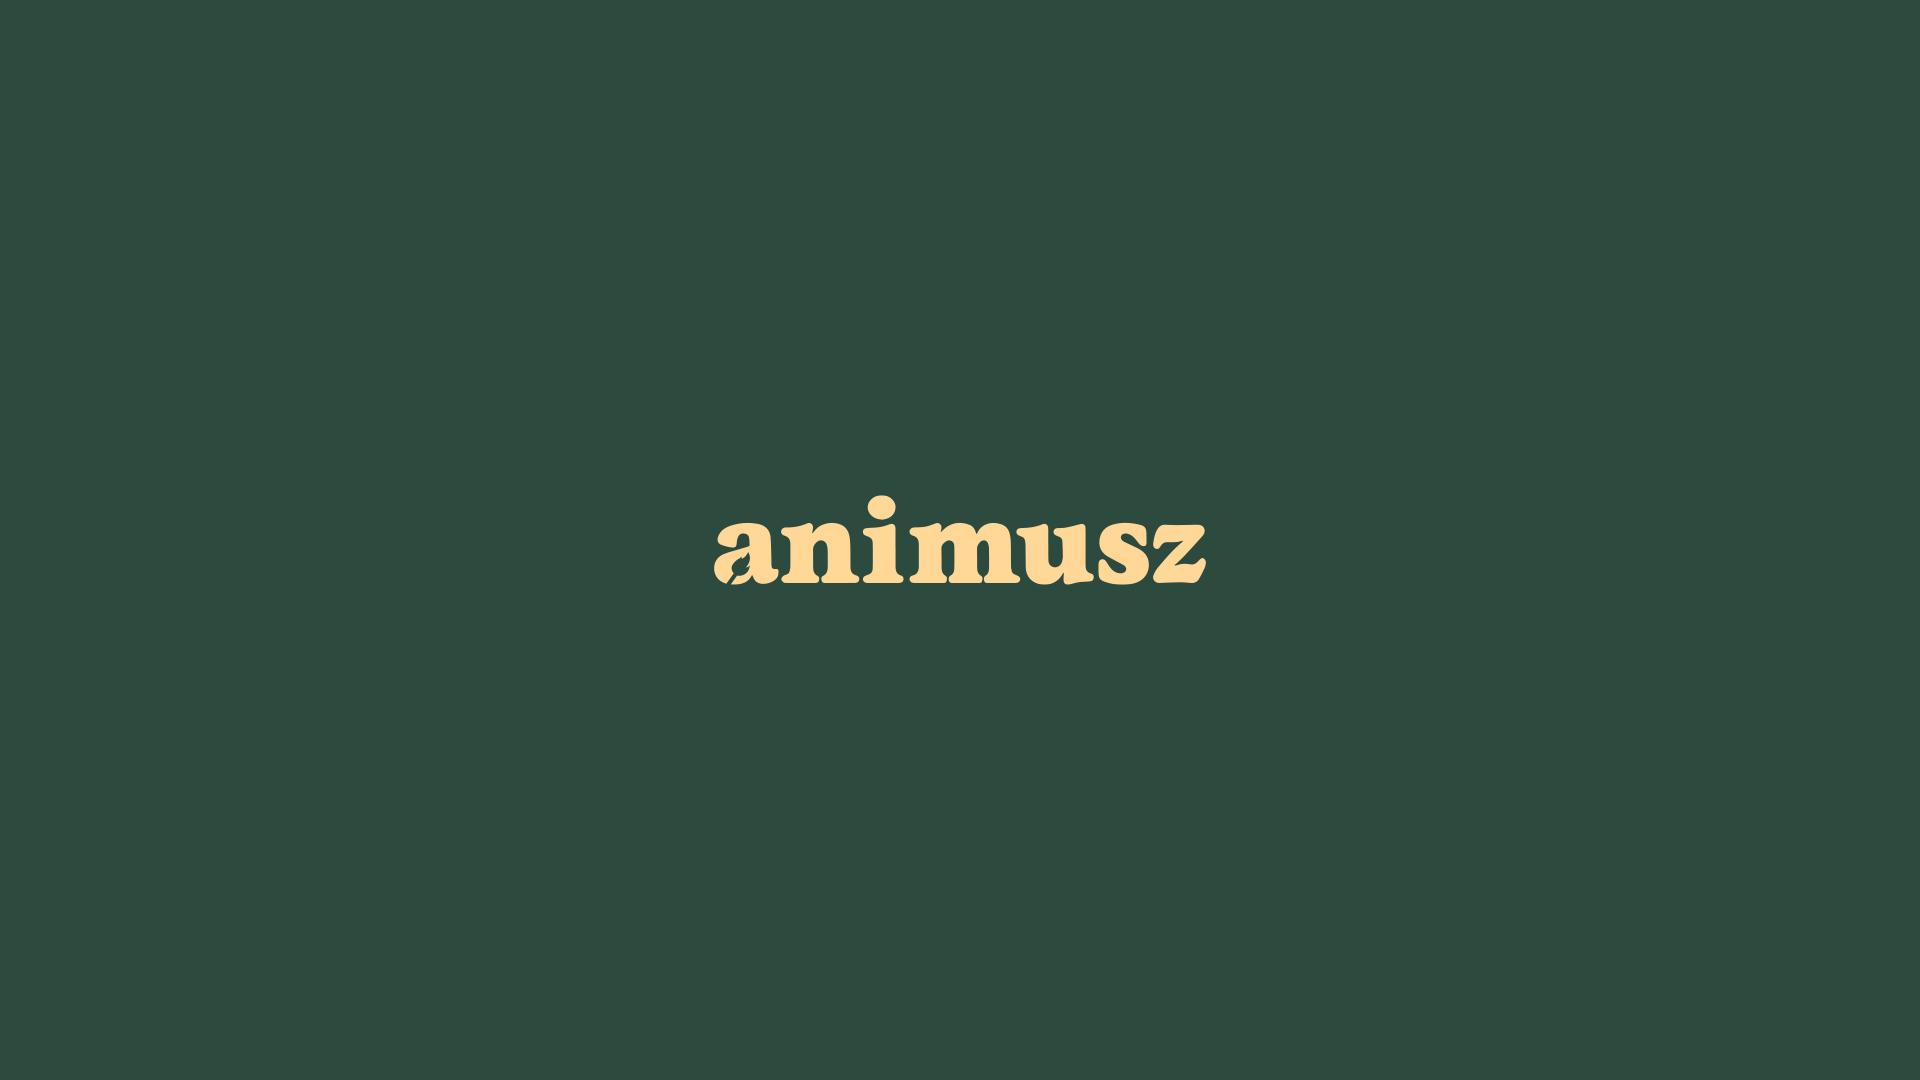 animusz_1